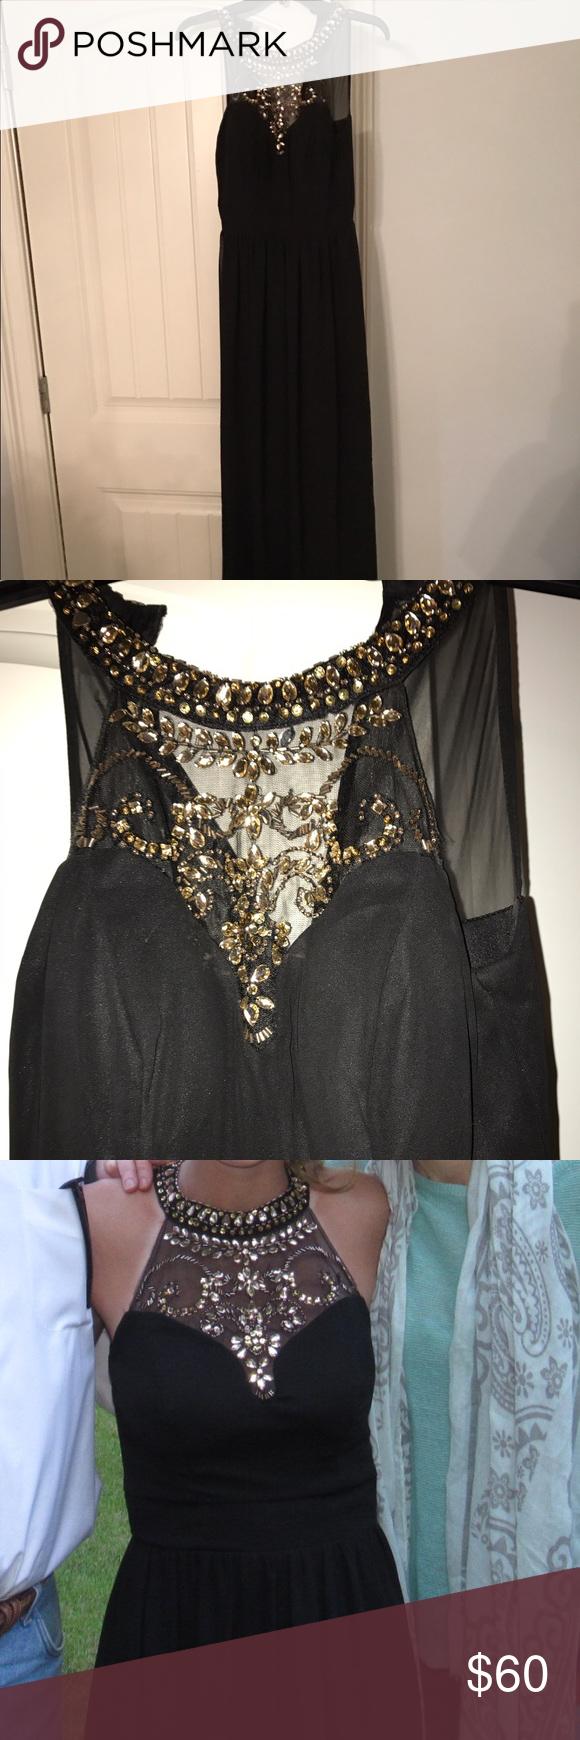 B. Darlin long black dress long black dress with gold beaded design B Darlin Dresses Prom